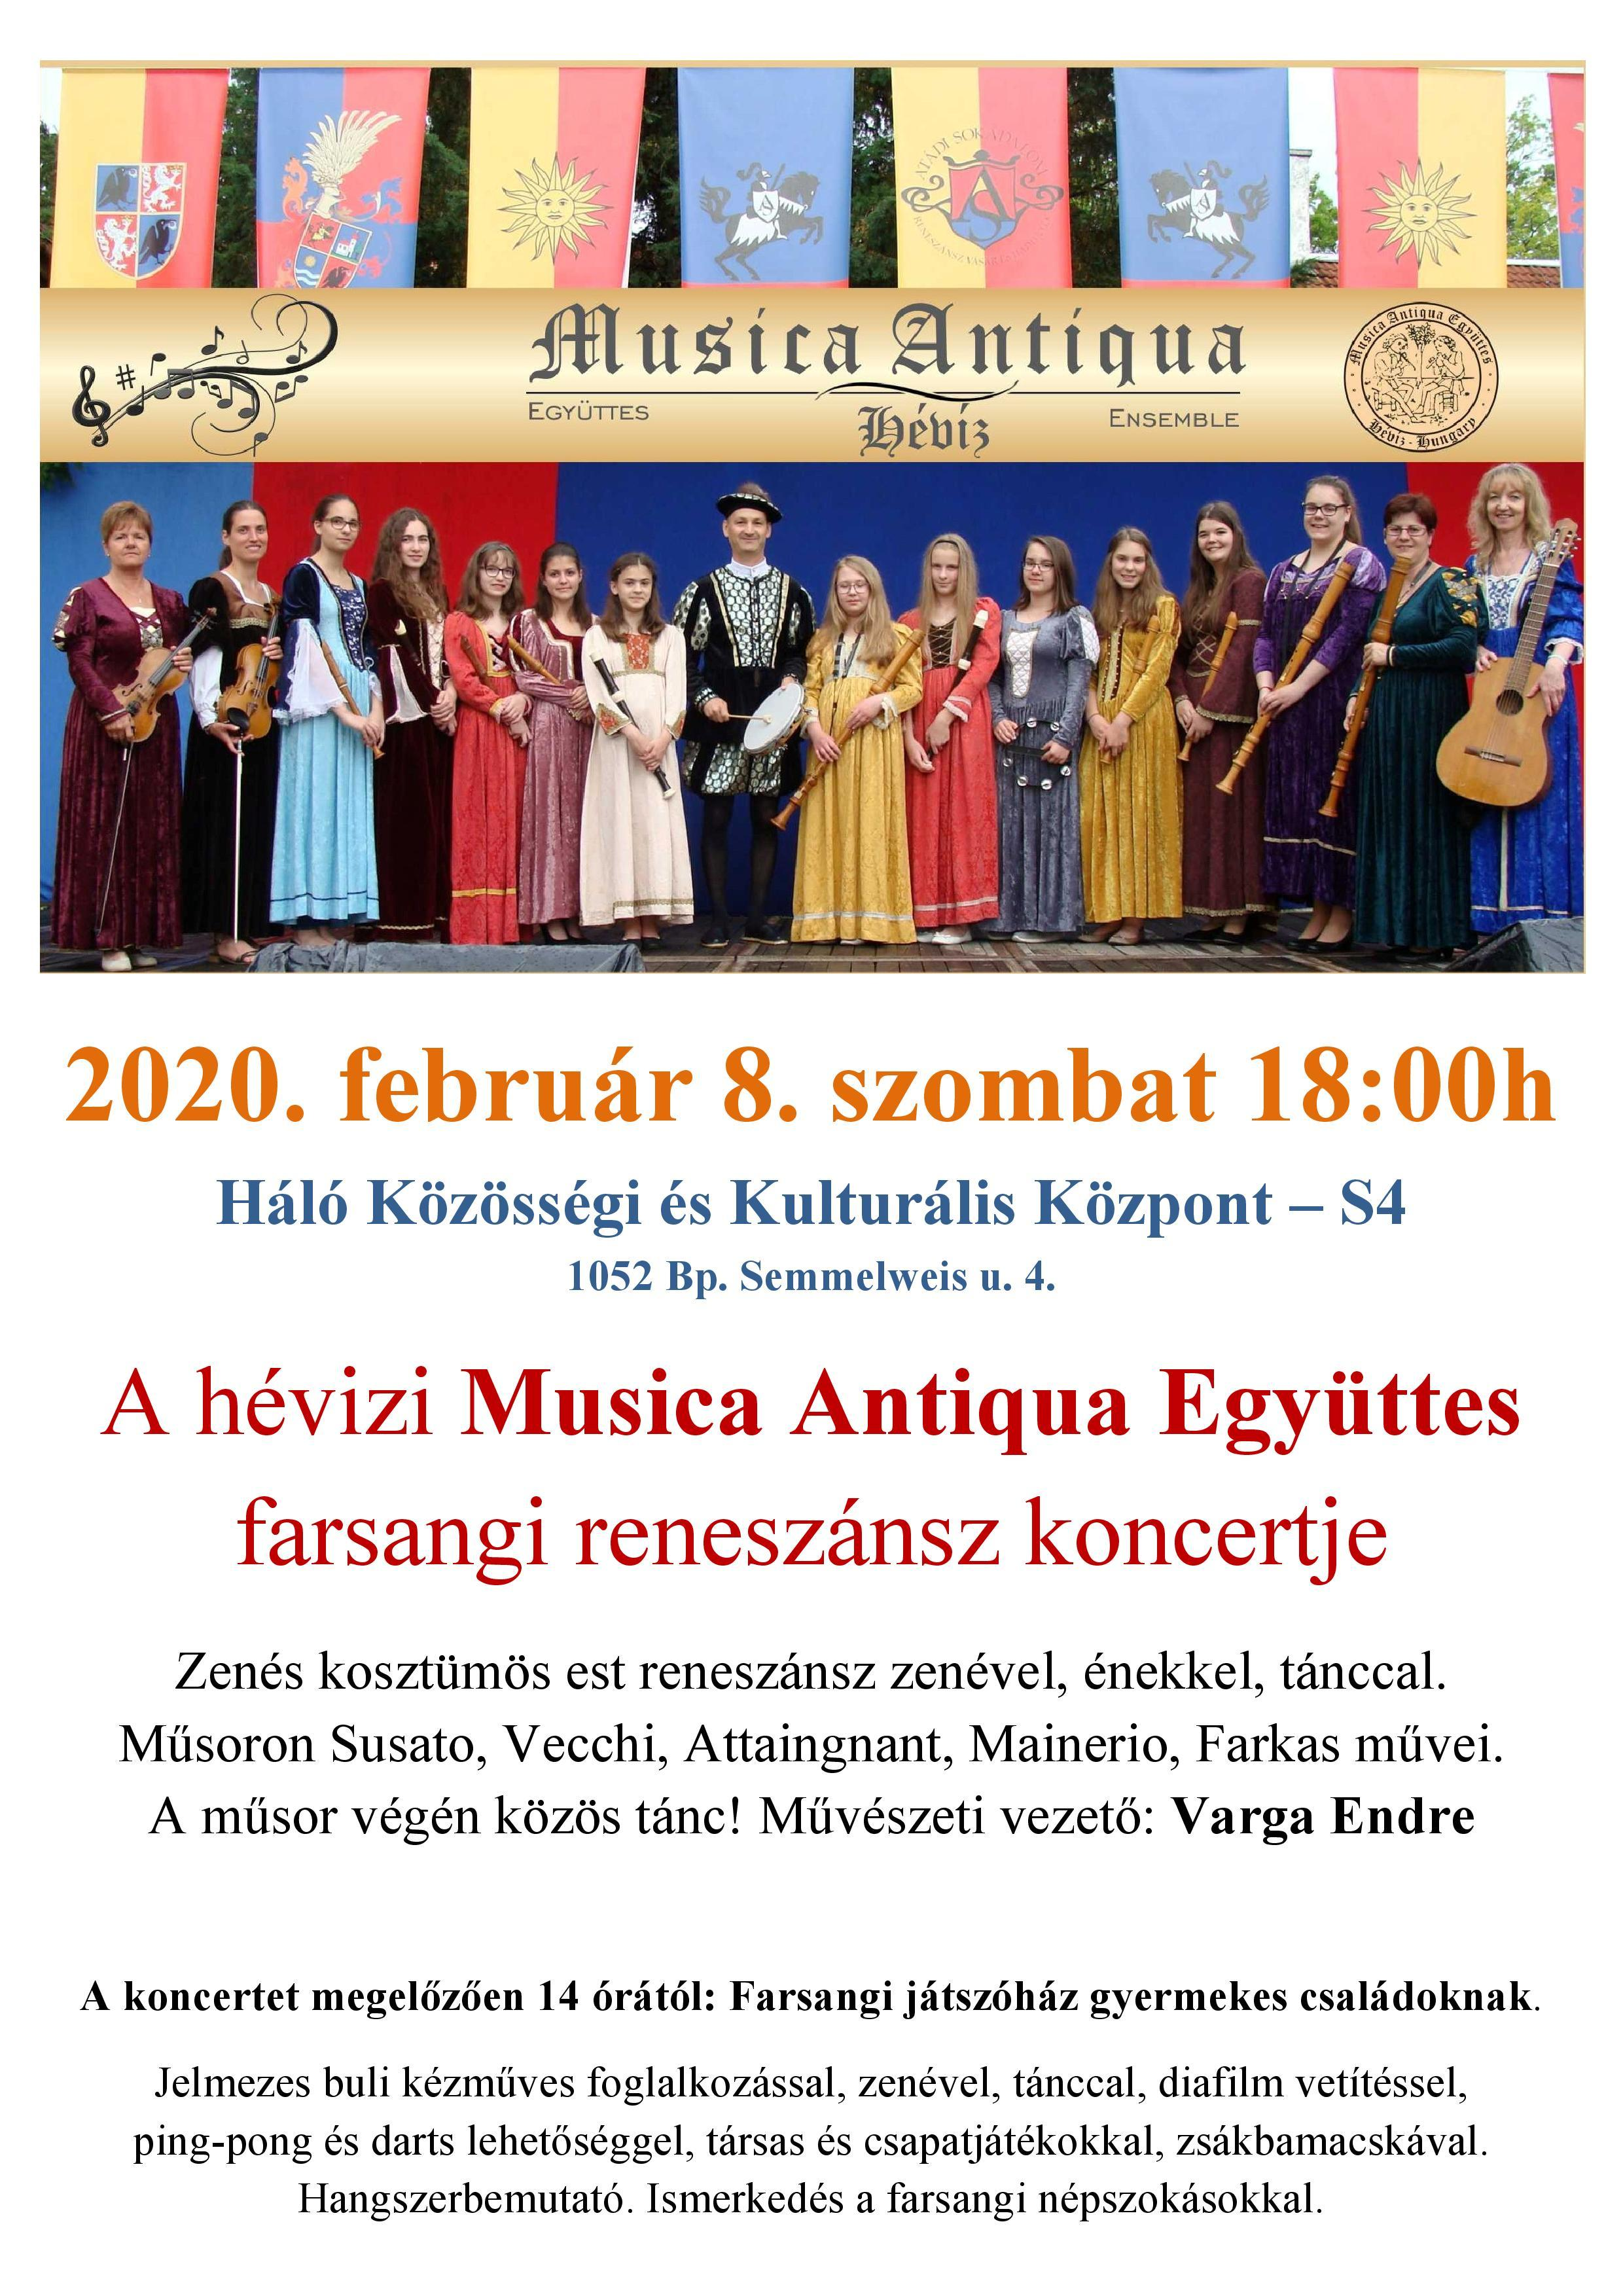 20-02-08-musica-antiqua.jpg